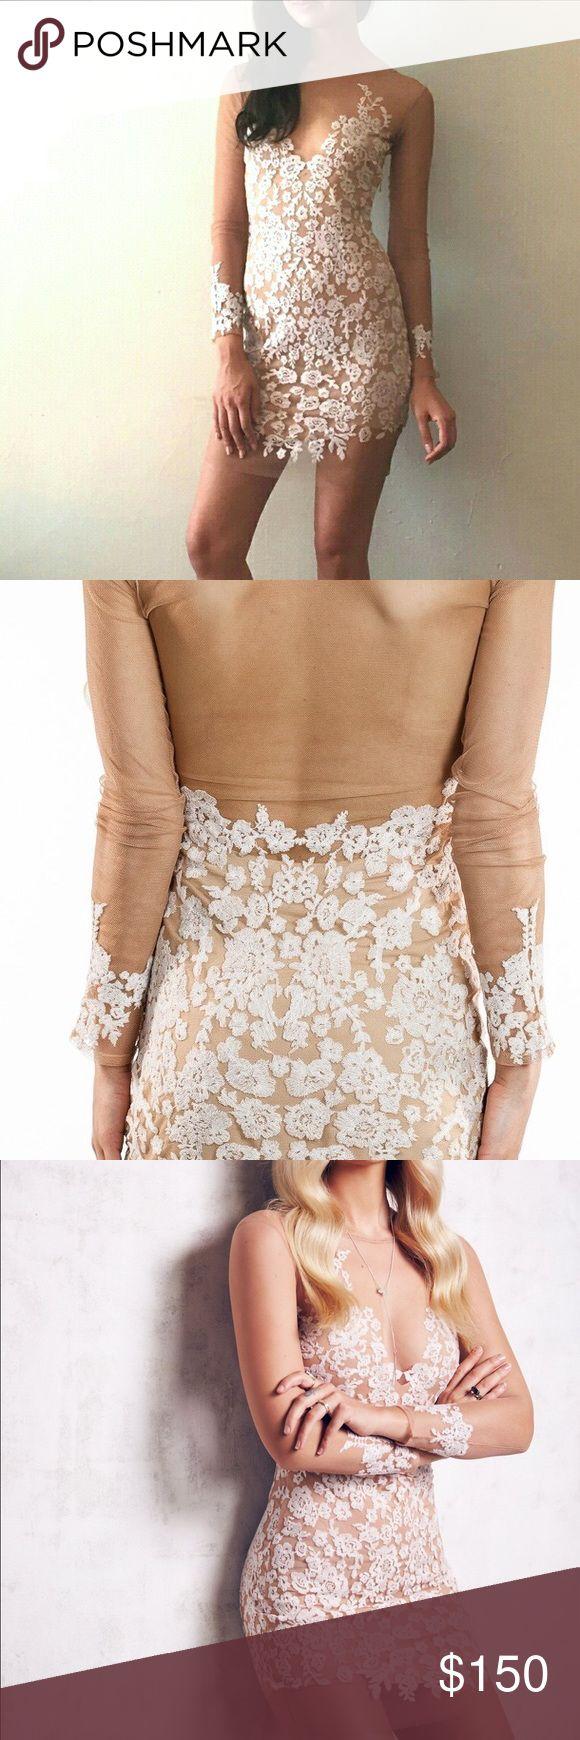 White embroidered mini dress For love and lemons white embroidered mini luau dress. For Love and Lemons Dresses Mini